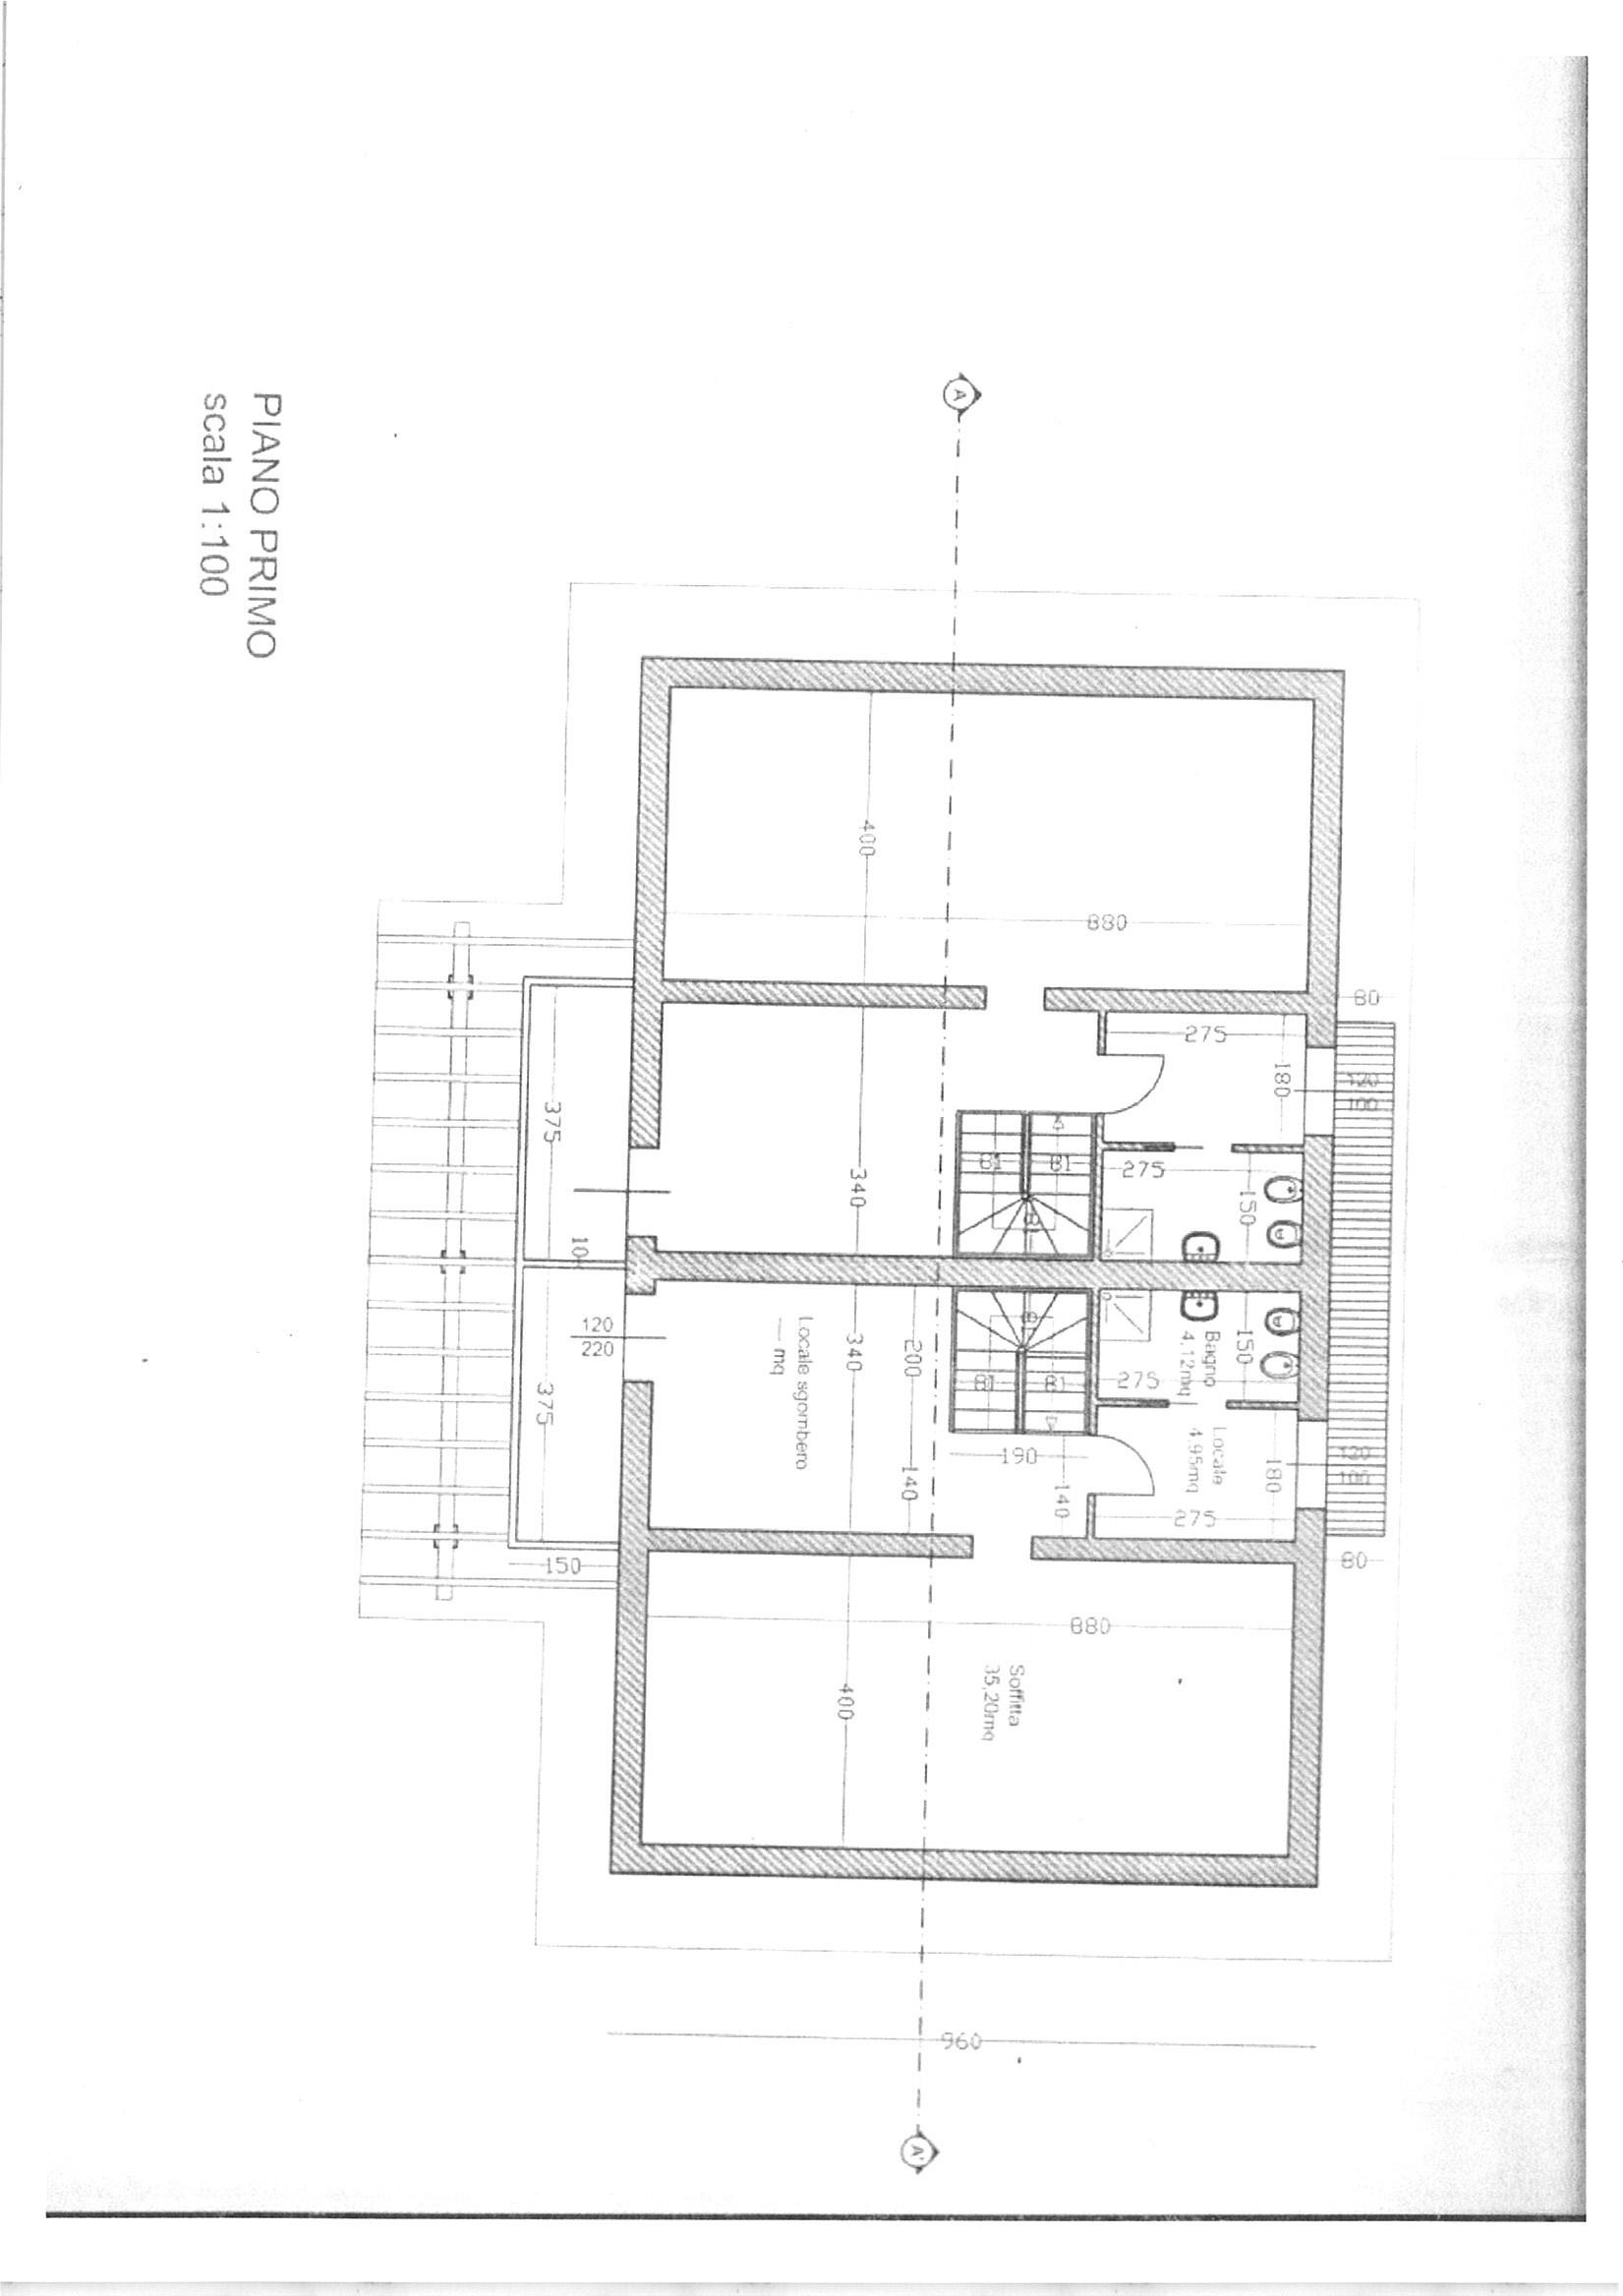 Planimetria 4/5 per rif. vbf lamm 160